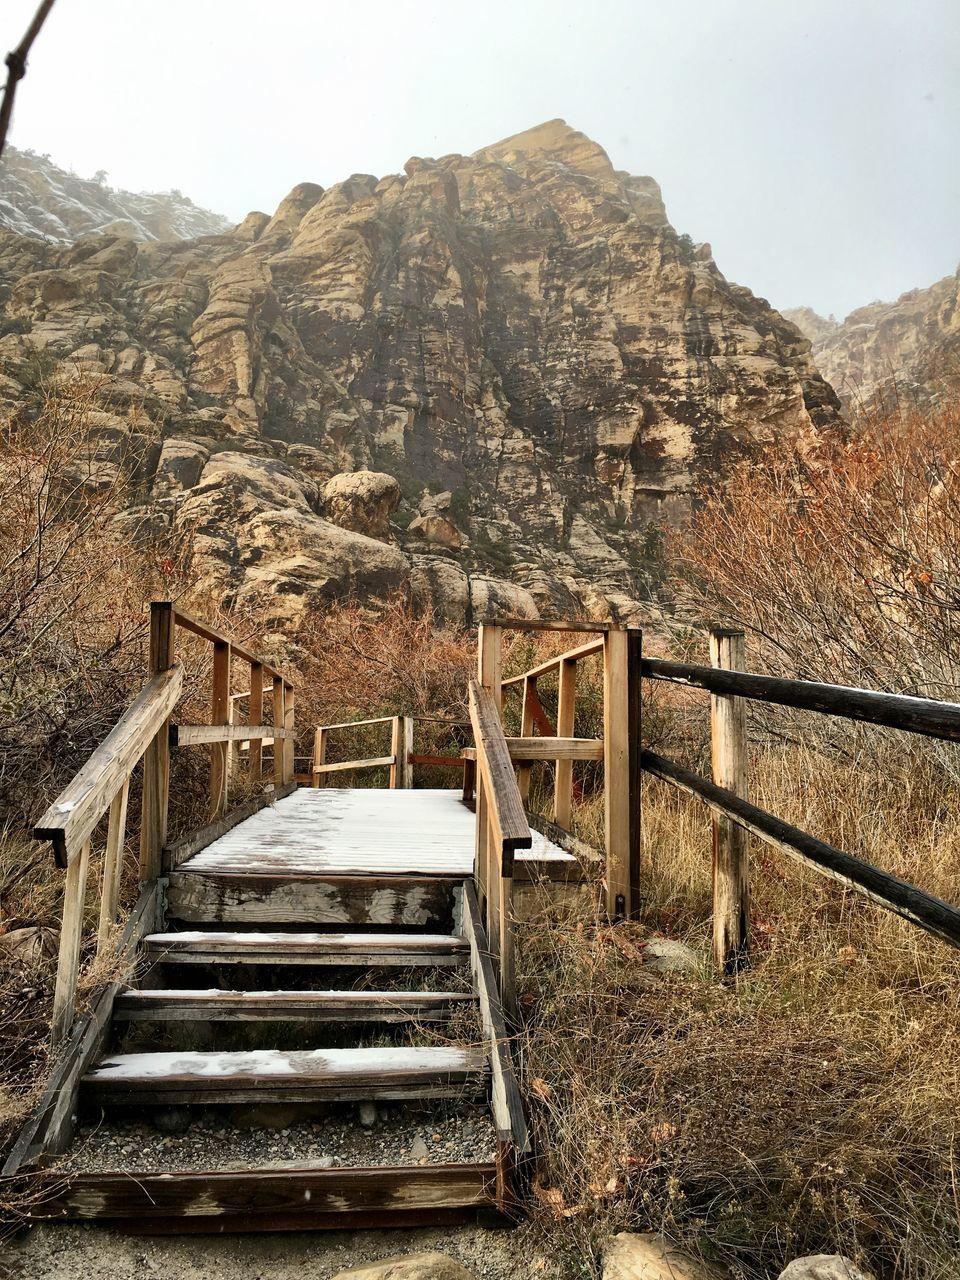 Footbridge Against Rocky Mountains